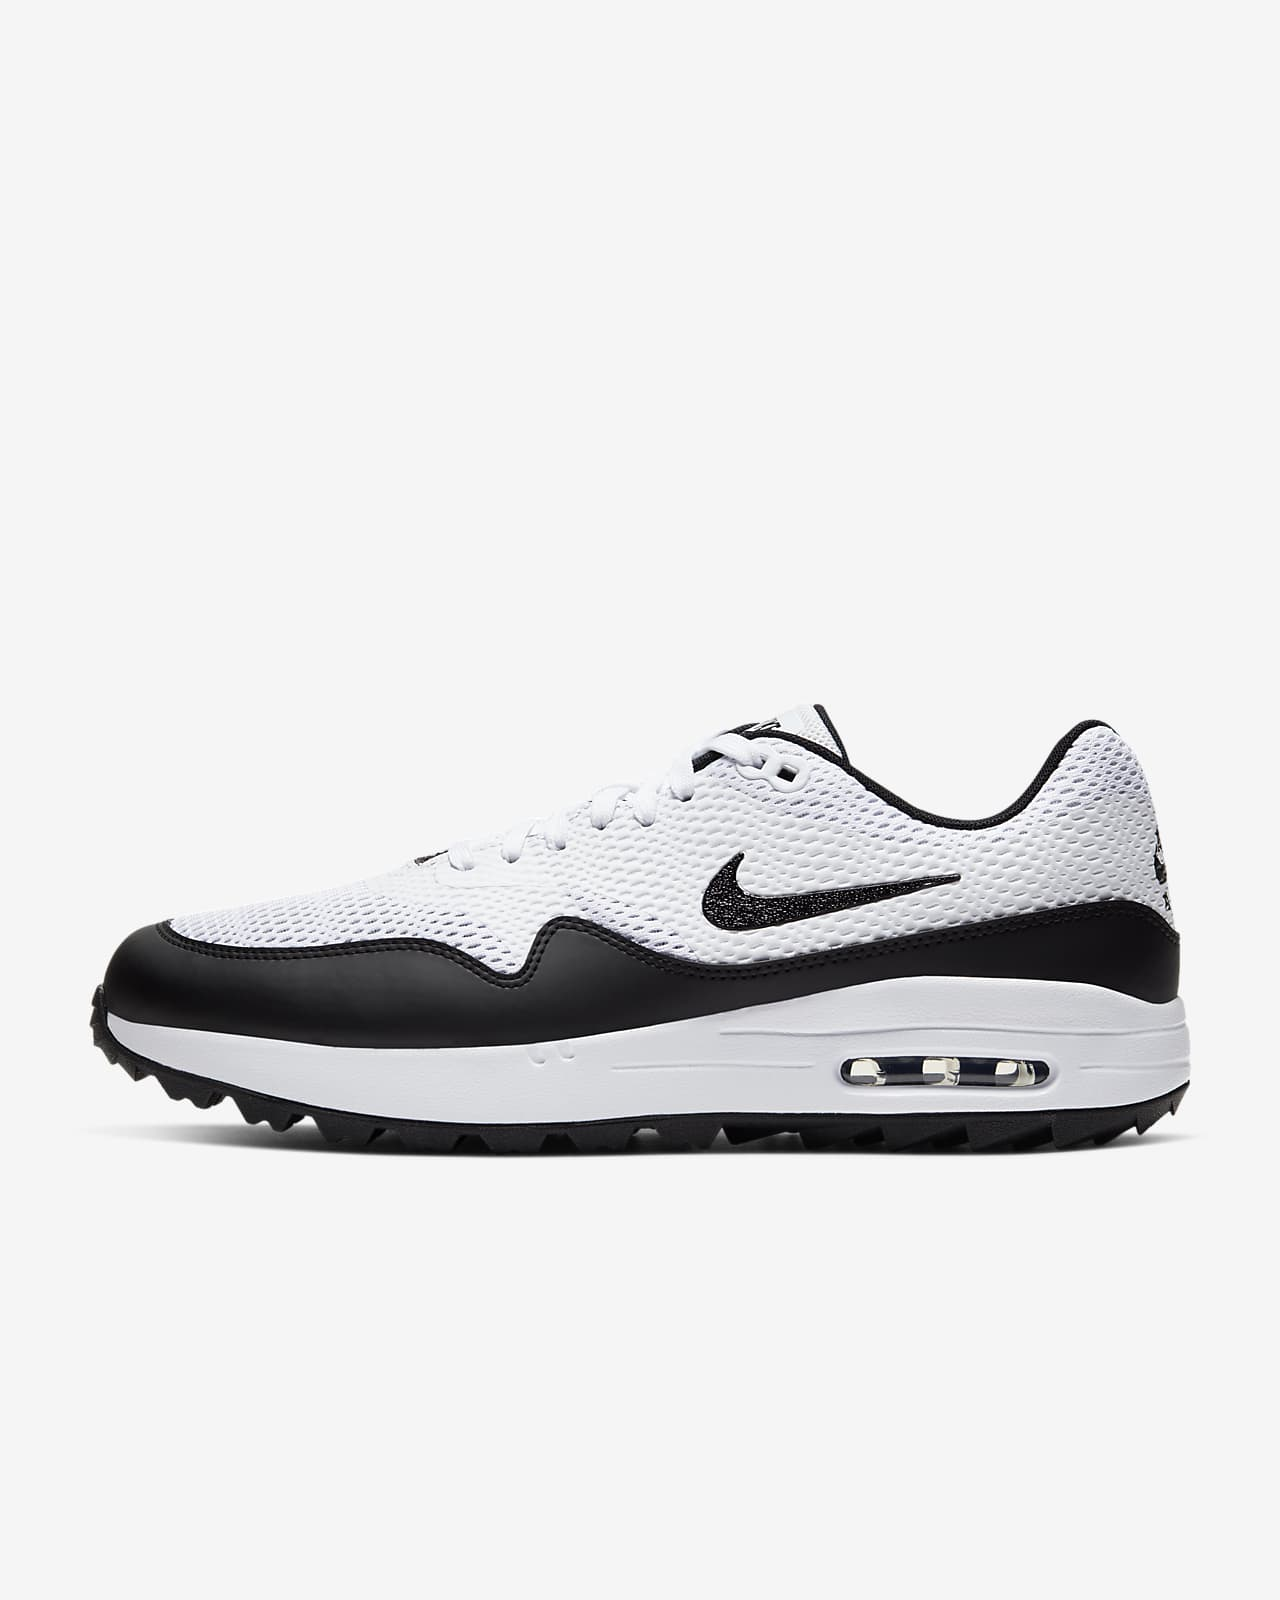 Calzado de golf para hombre Nike Air Max 1 G